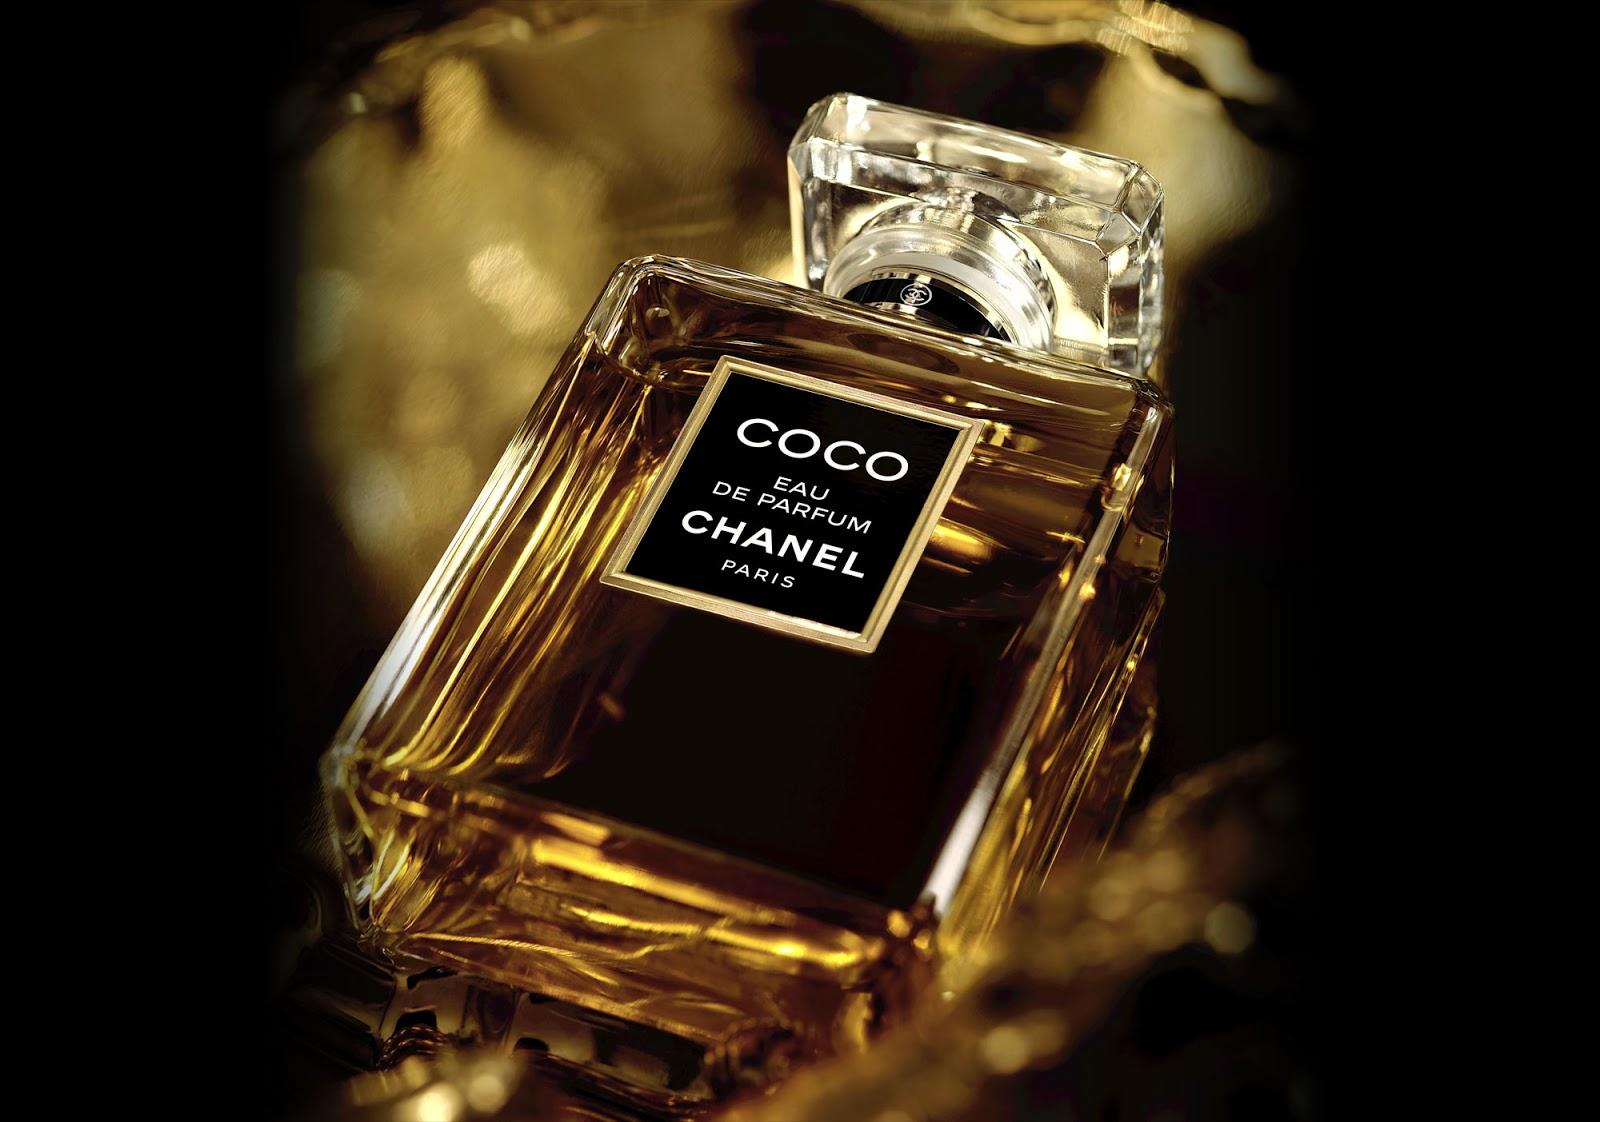 coco by chanel eau de parfum original 80s perfume fragrance perfumeshrine.com